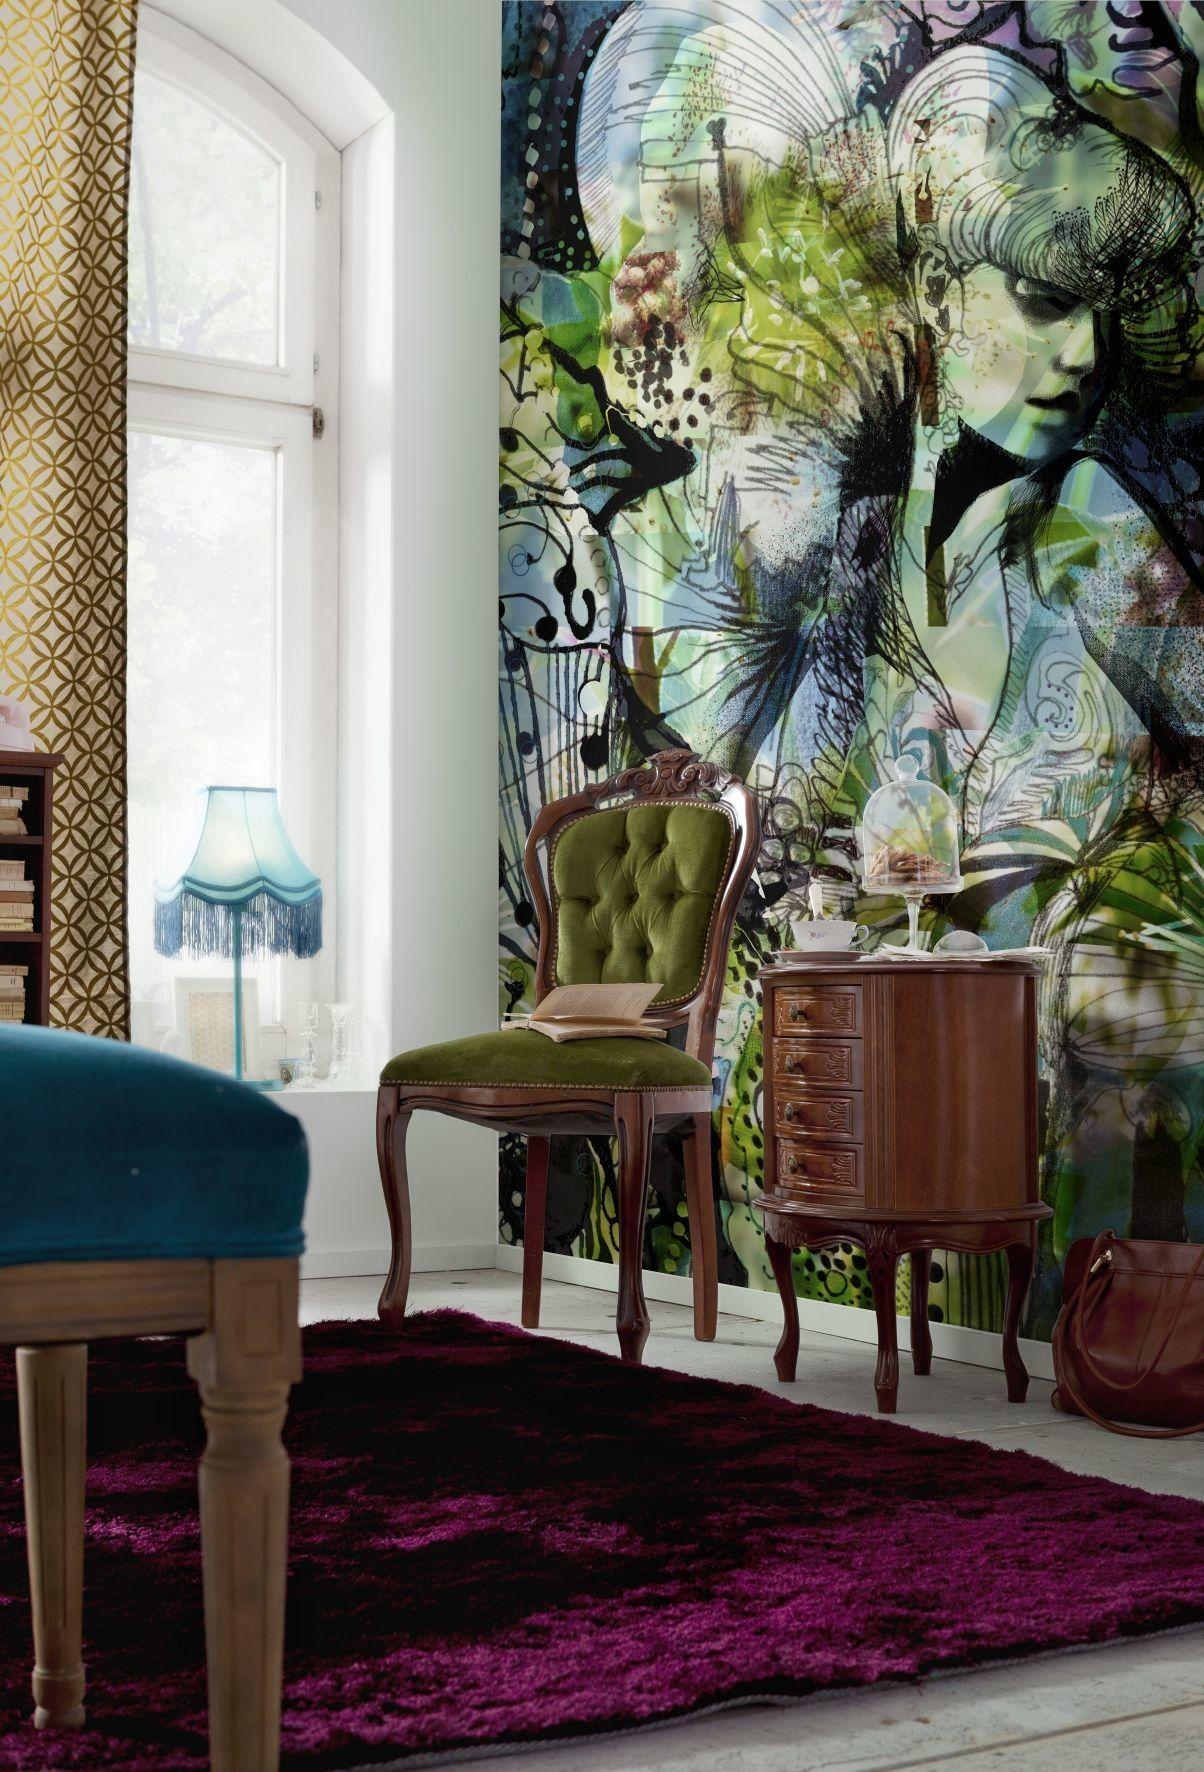 Brewster Home Fashions Komar Aphrodites Garden Wall Mural - Wayfair